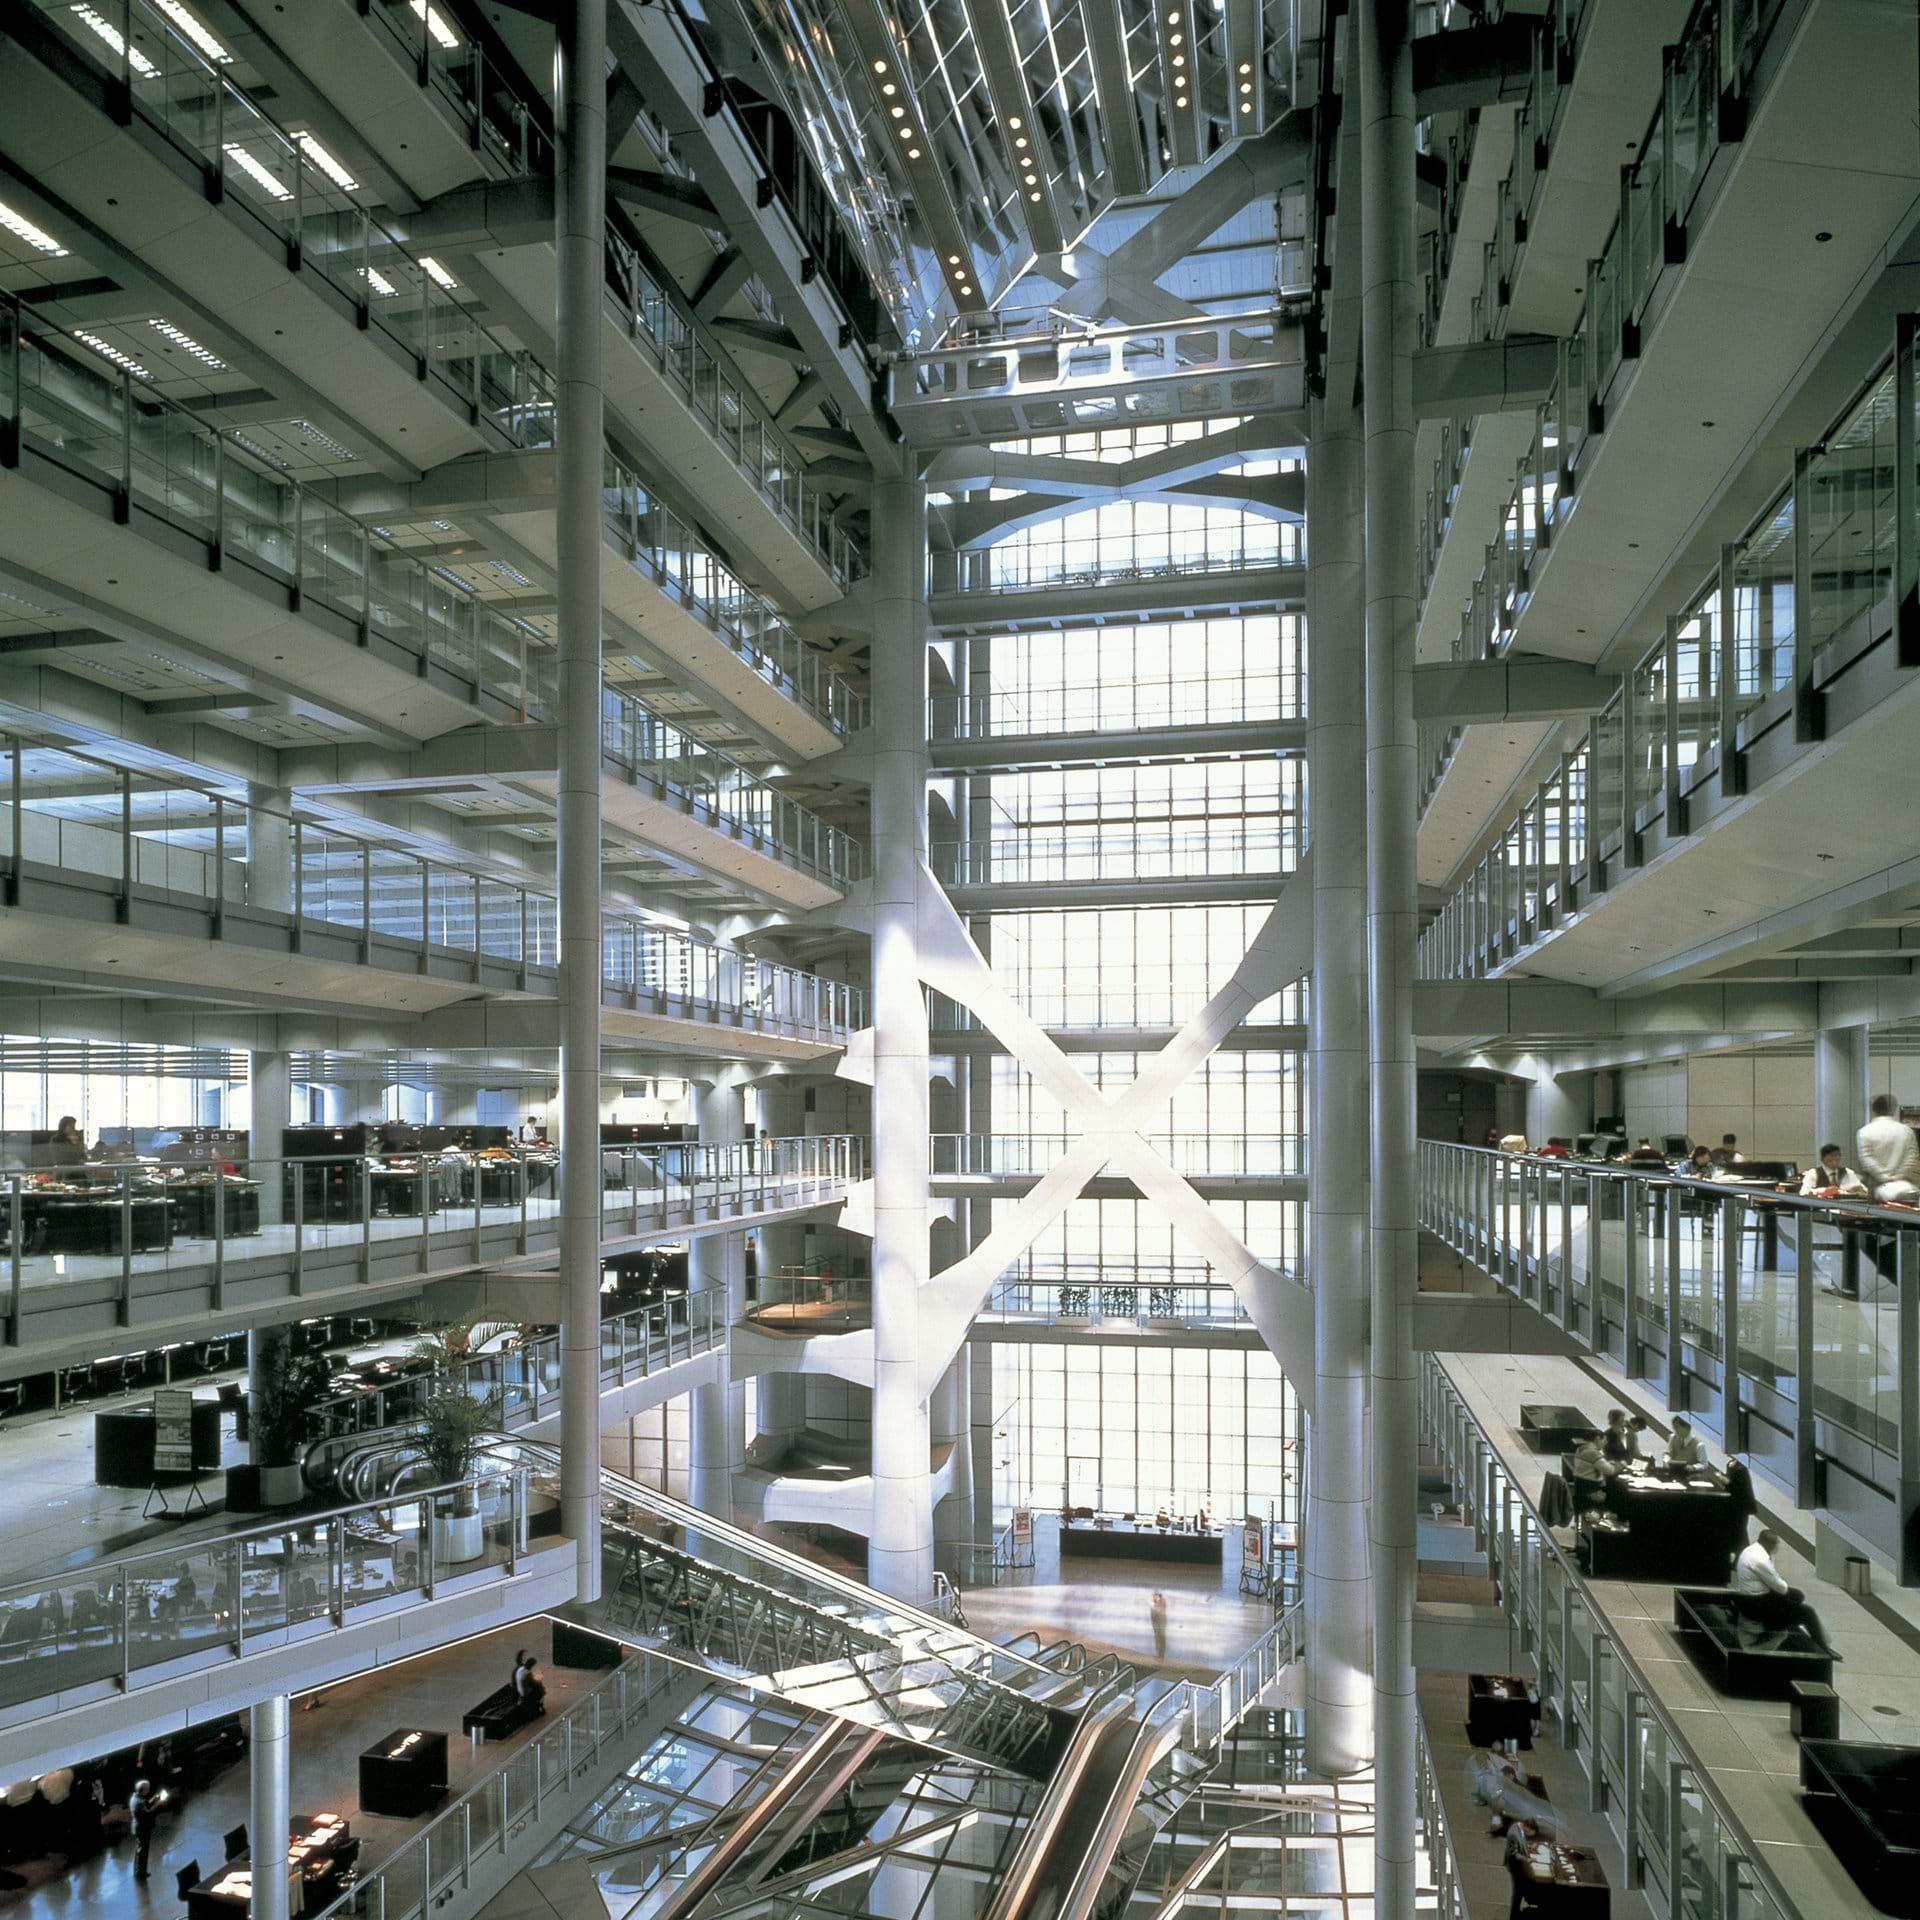 Es la sede del banco HSBC